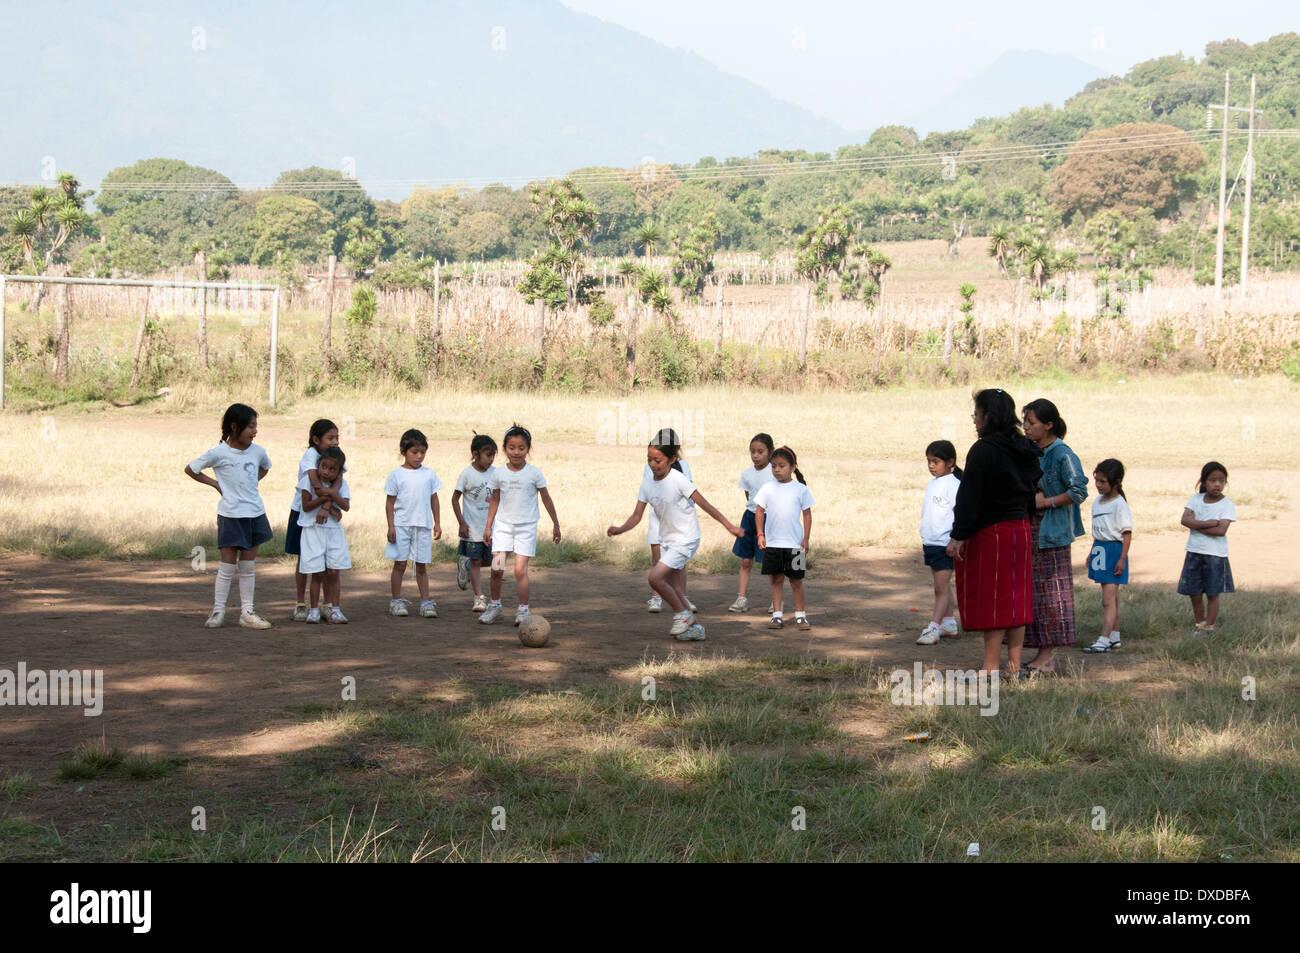 Schoolgirls in Guatemala playing soccer - Stock Image